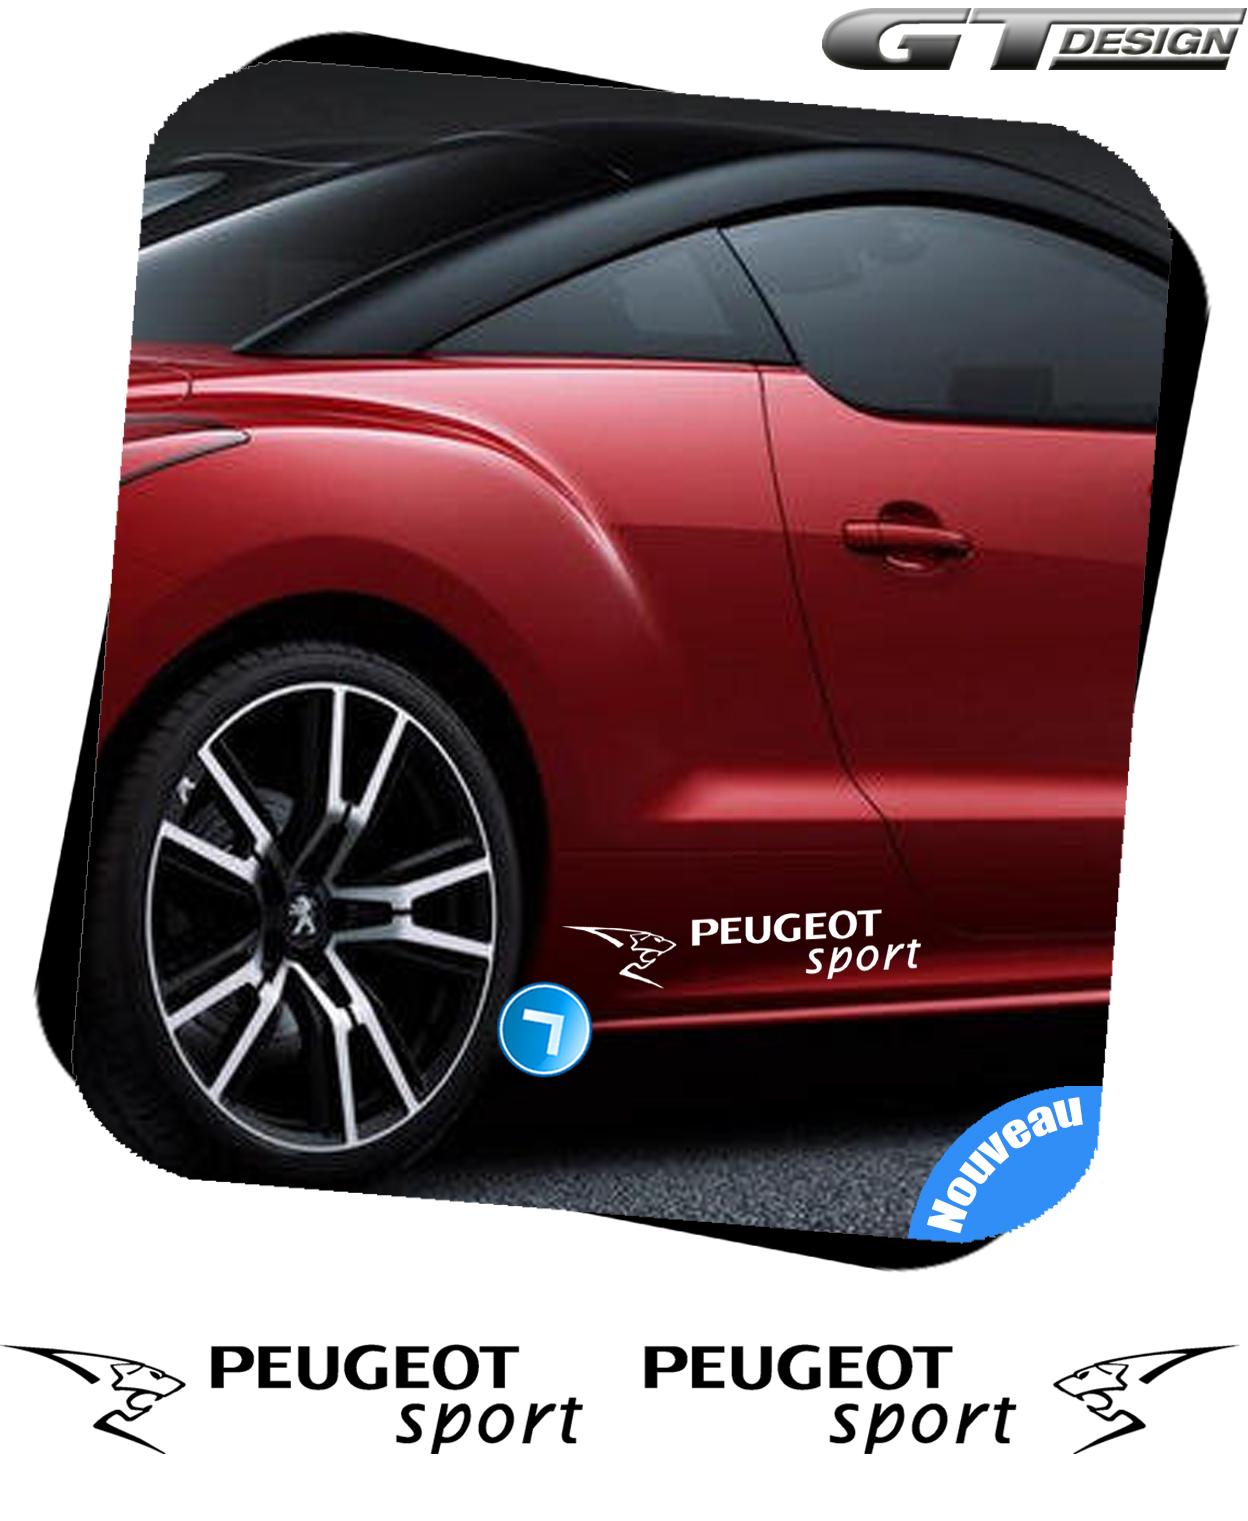 2 sticker autocollant peugeot sport 106 206 207 208 306. Black Bedroom Furniture Sets. Home Design Ideas